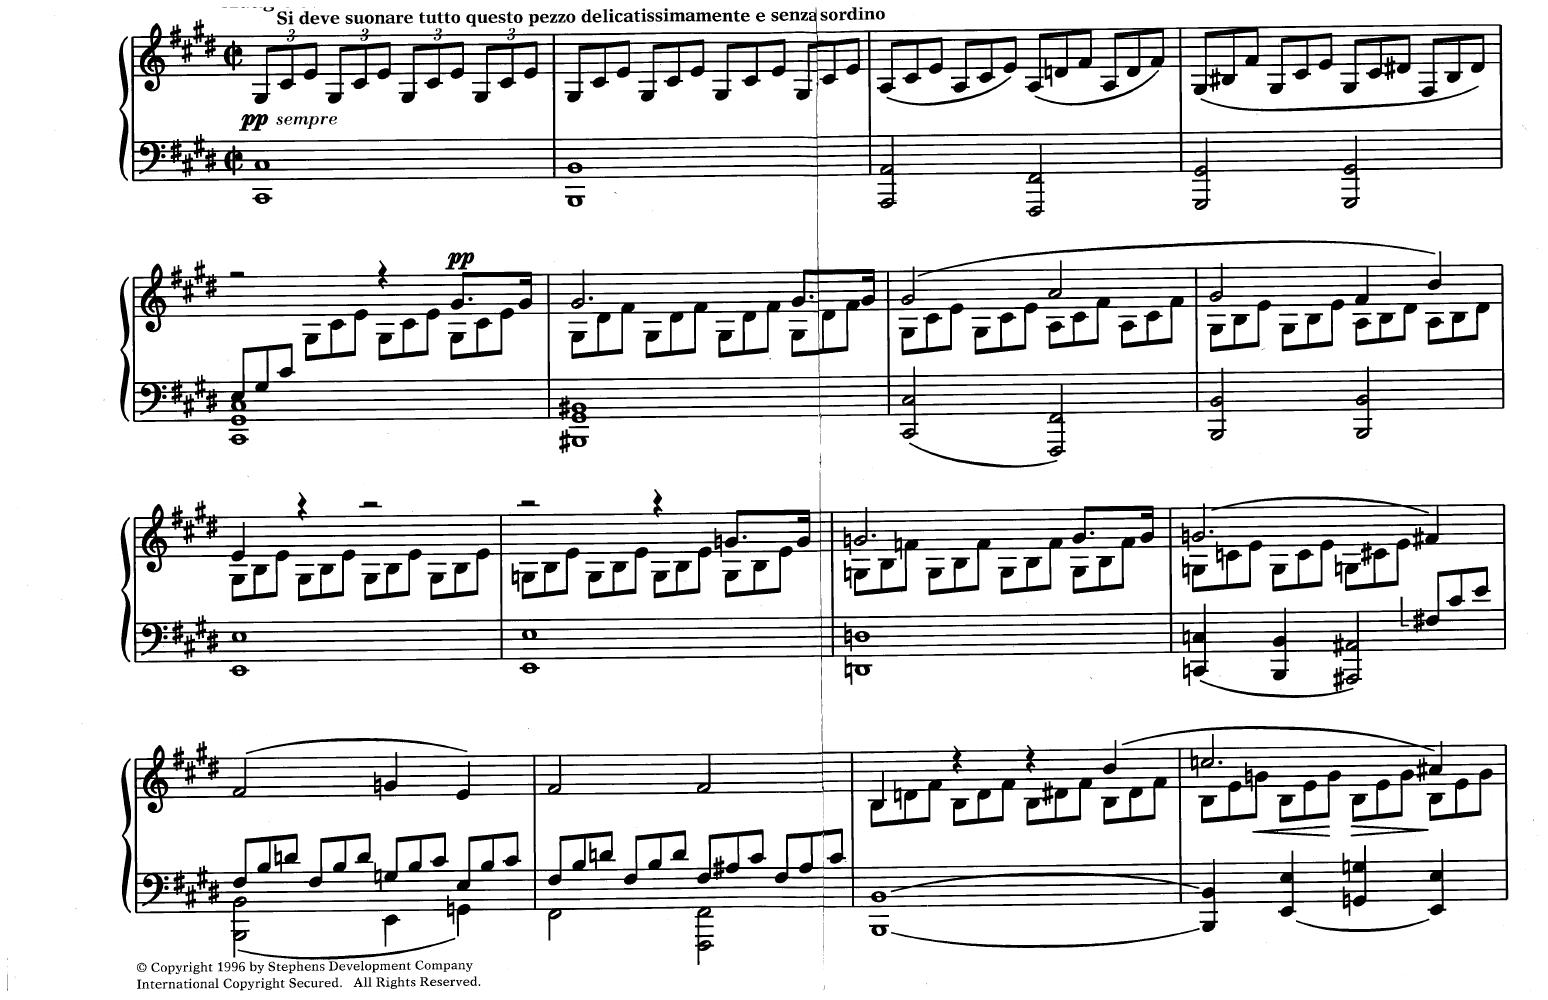 Moonlight Sonata by Ludwig van Beethoven| J W  Pepper Sheet